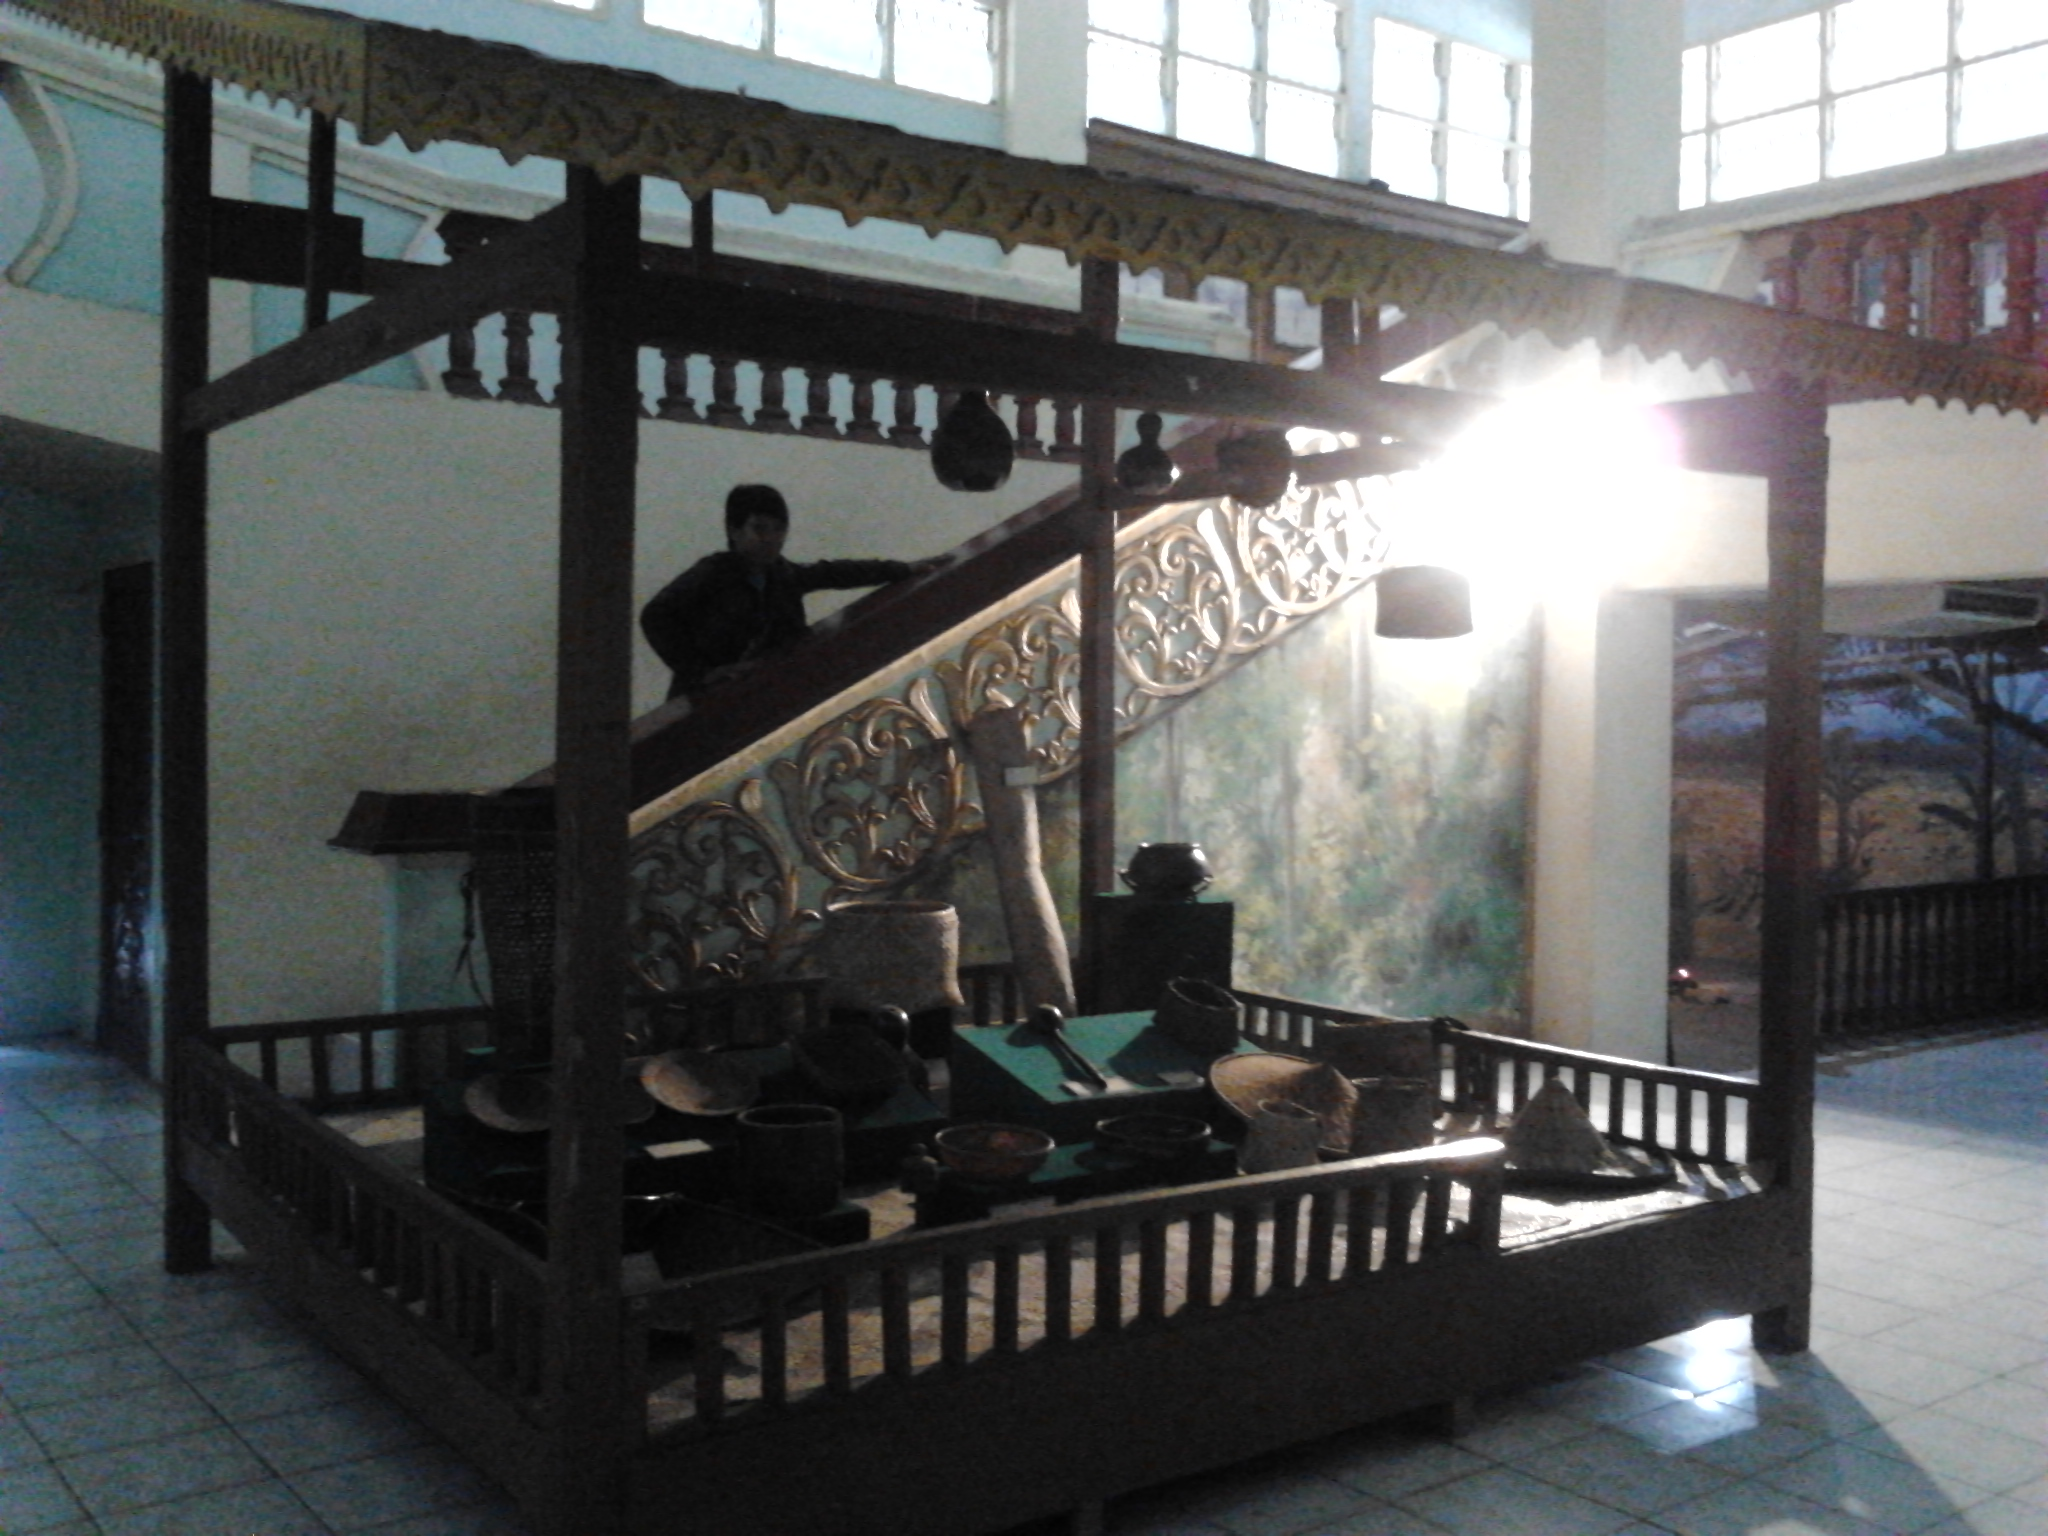 Museum Sang Nila Utama Pekanbaru Riau Infobergelora